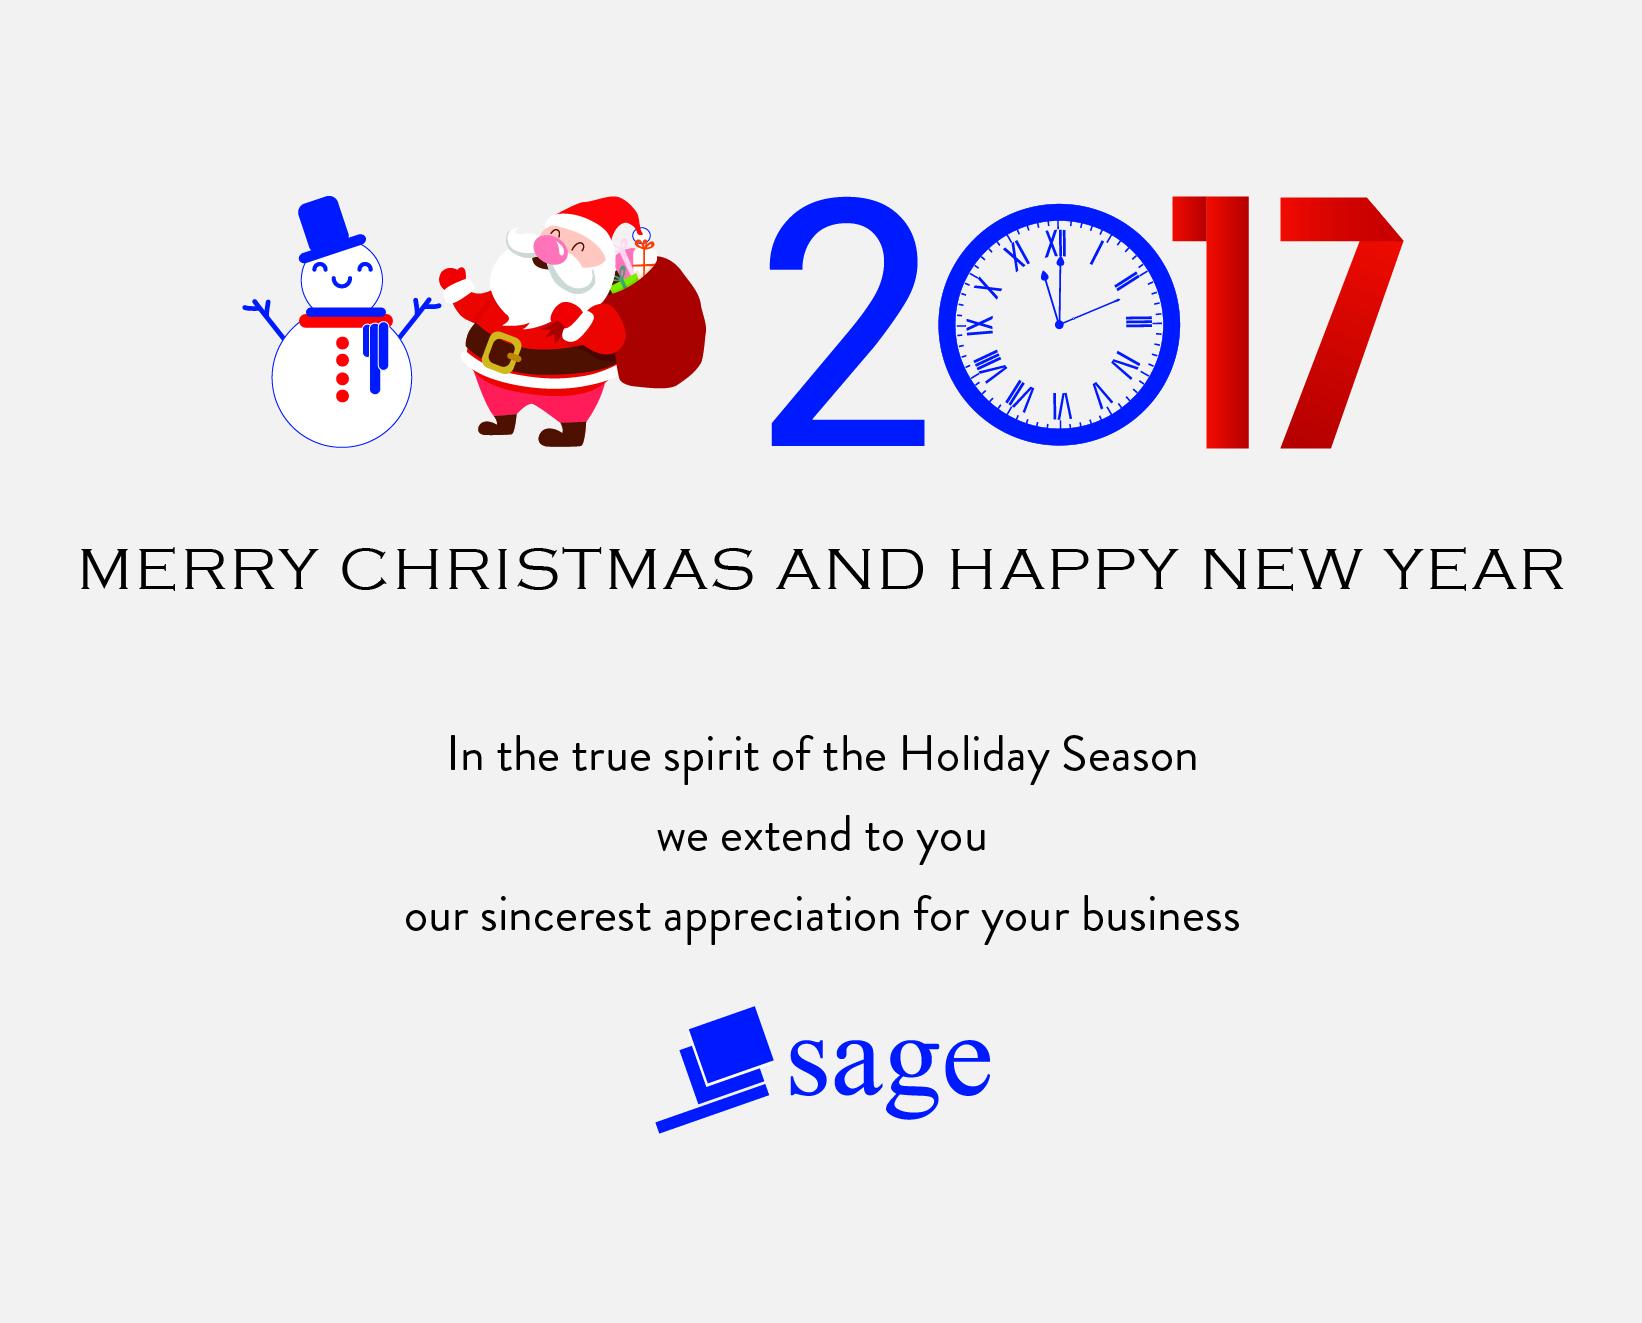 Sage english editing service